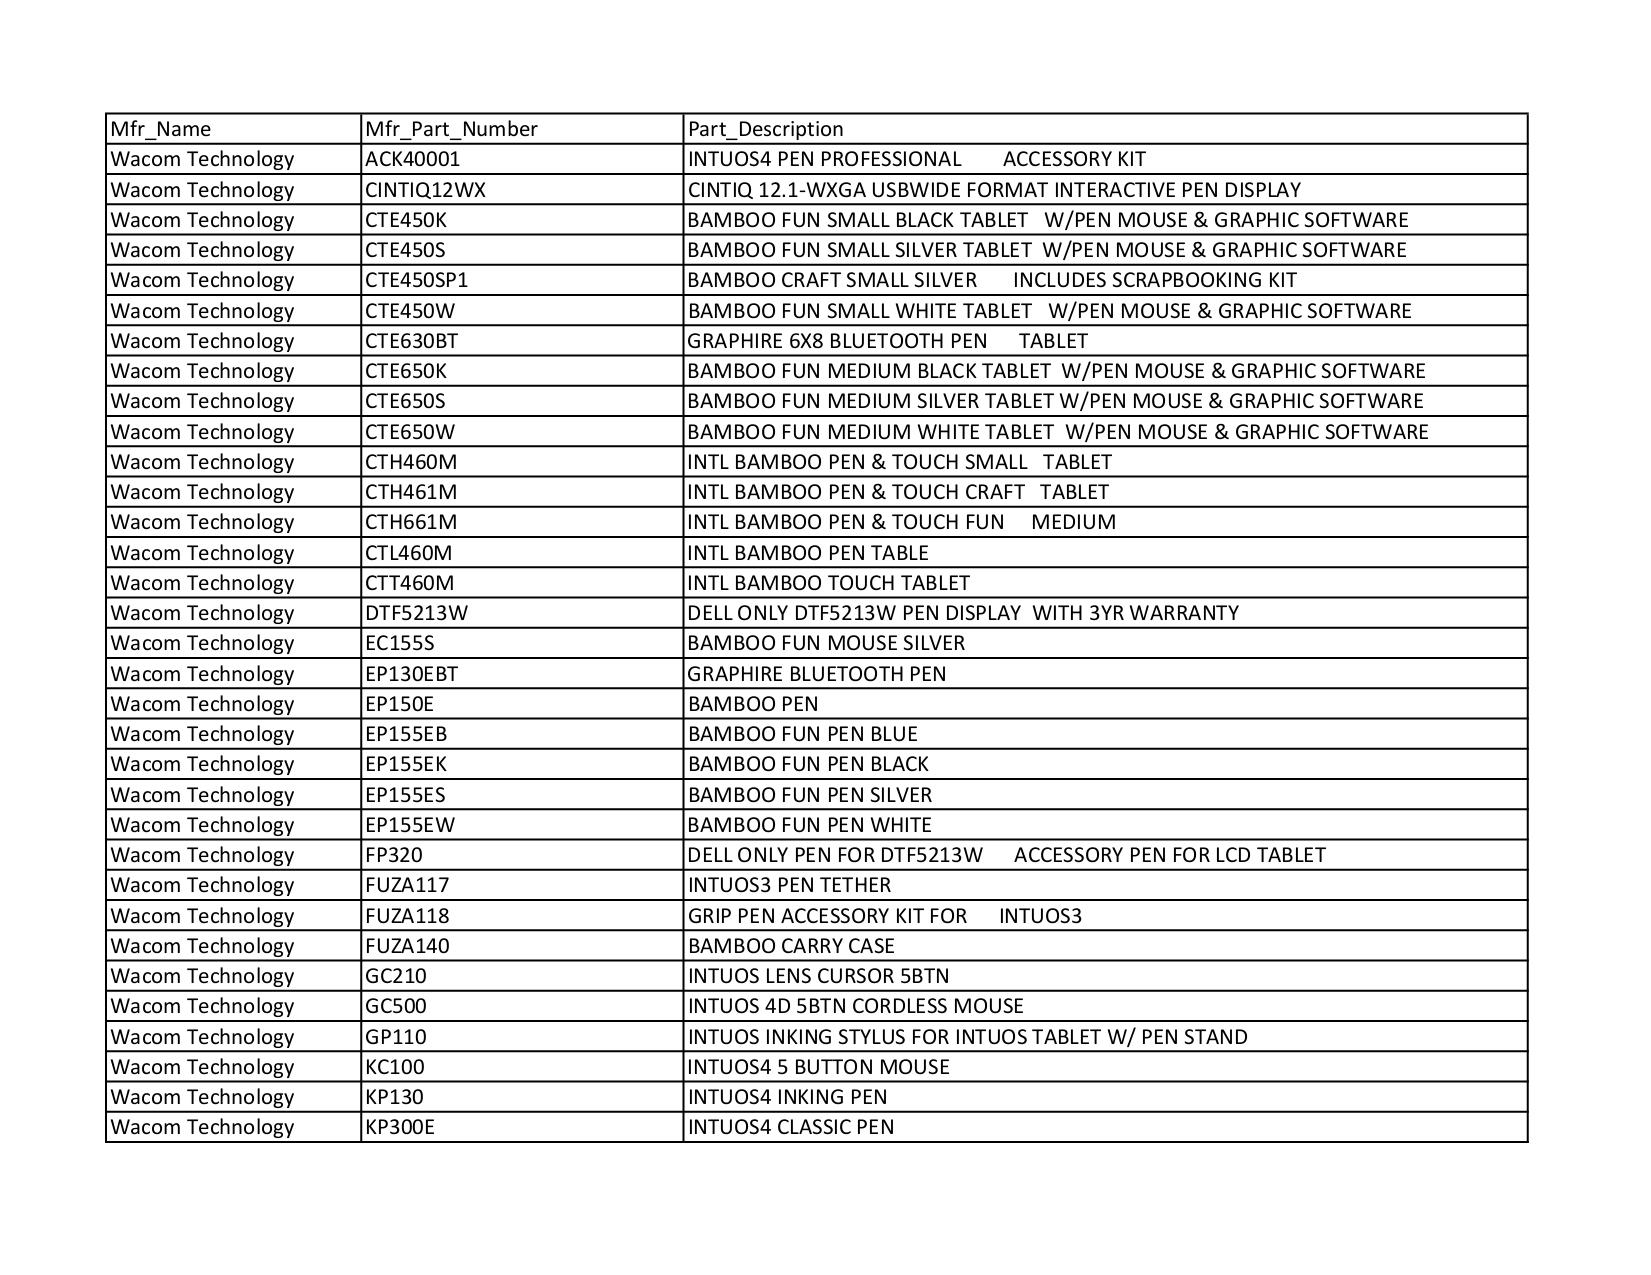 pdf for Wacom Mouse Intuos3 12x19 manual